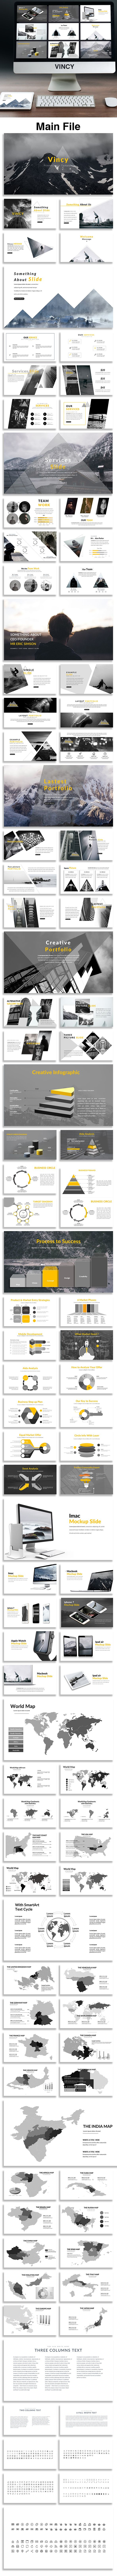 Vincy - Creative PowerPoint Template - Creative PowerPoint Templates